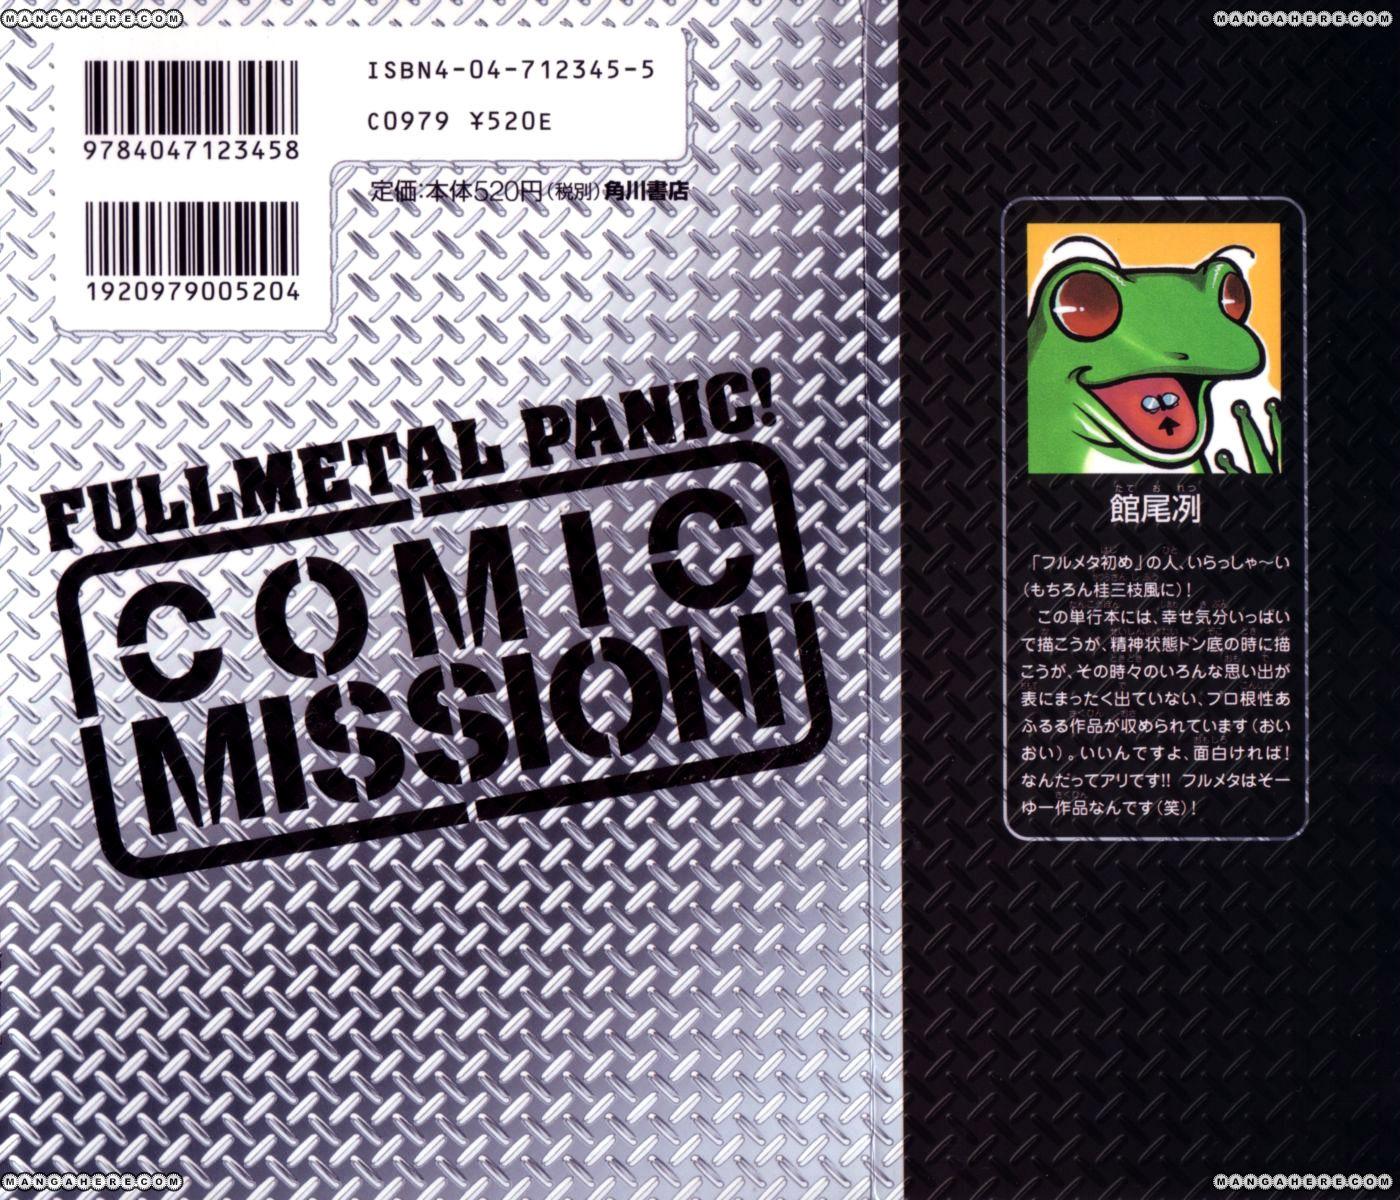 Full Metal Panic Comic Mission 5.5 Page 2